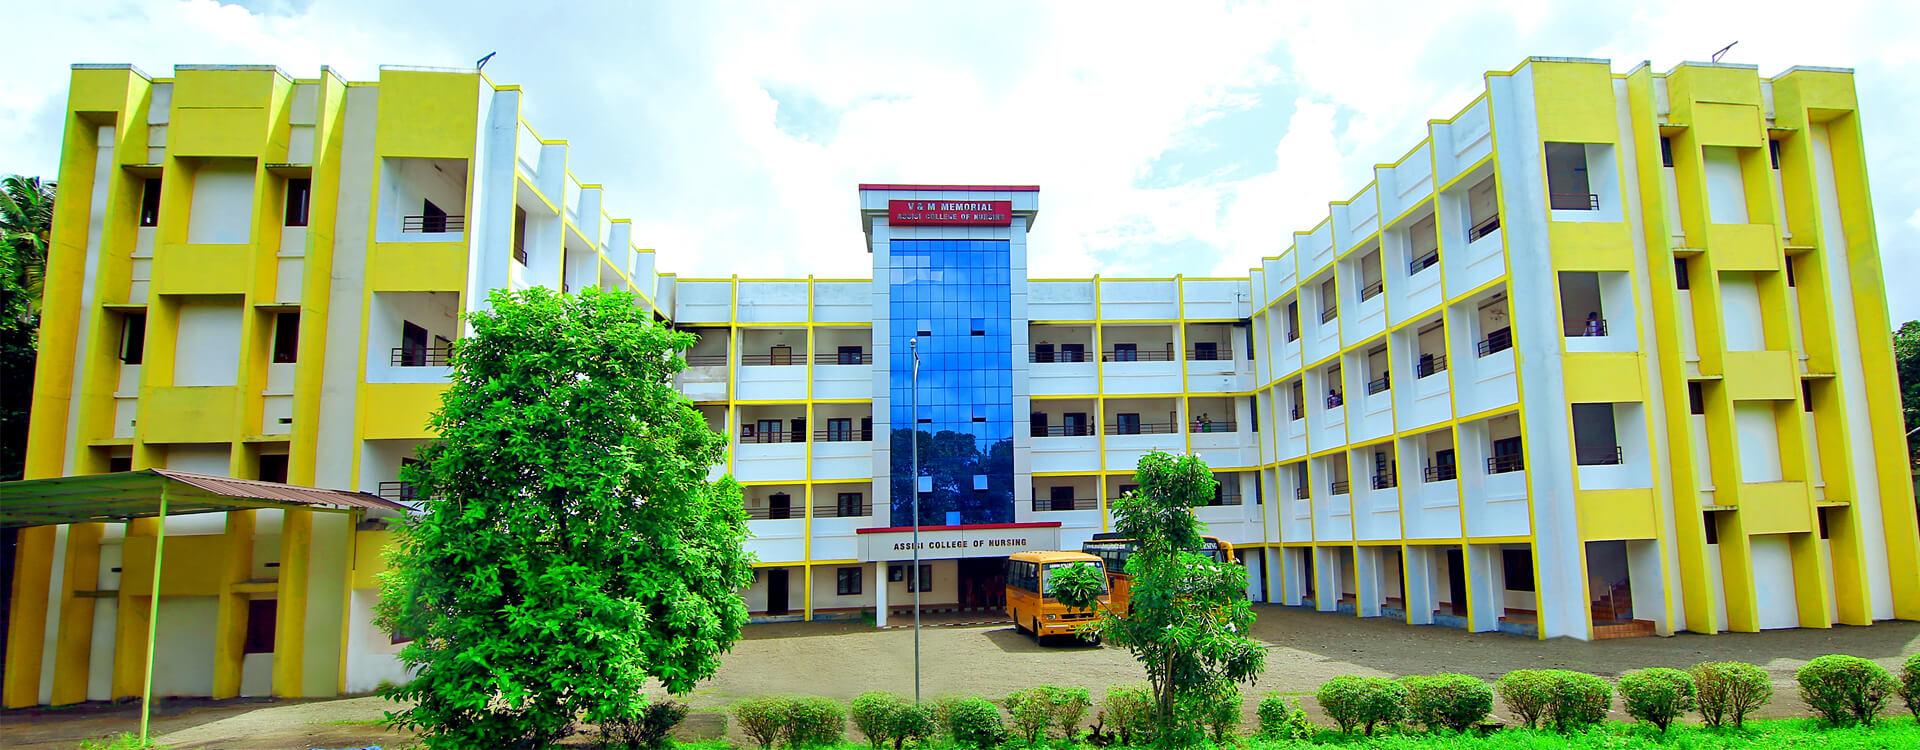 Assisi College Of Nursing, Kottayam Image